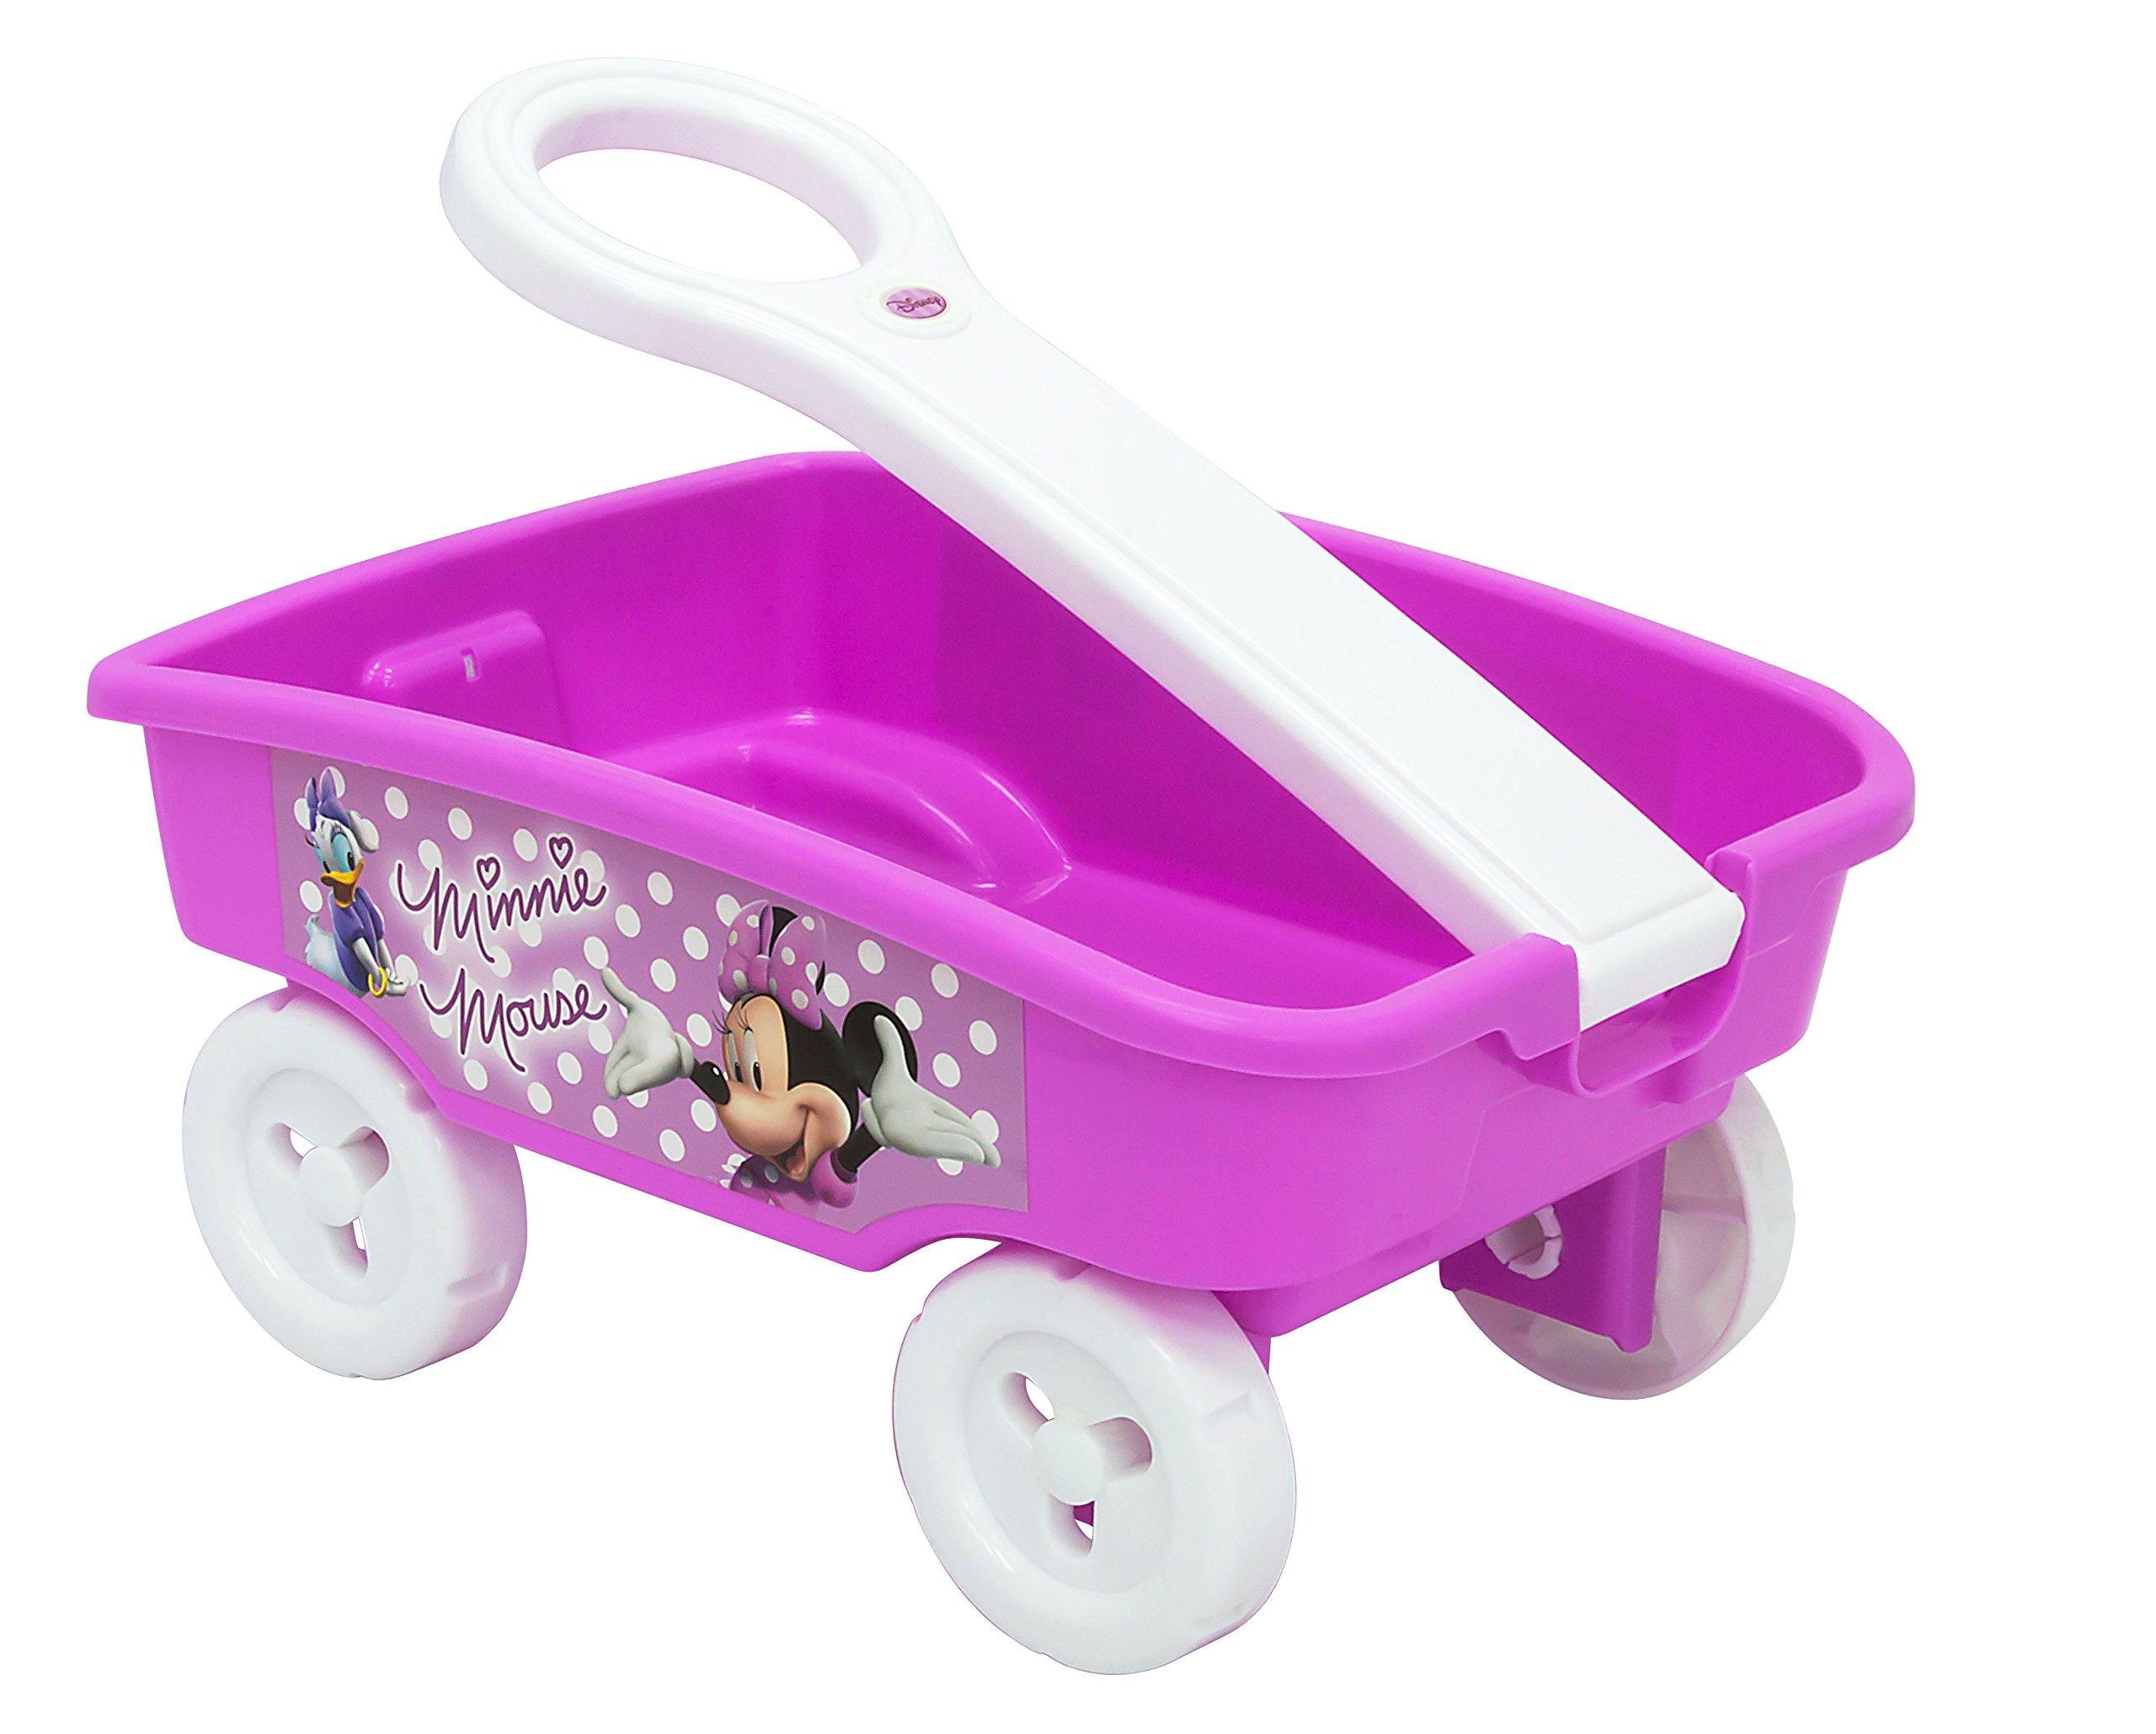 Minnie Mouse Disney BowTique Wagon